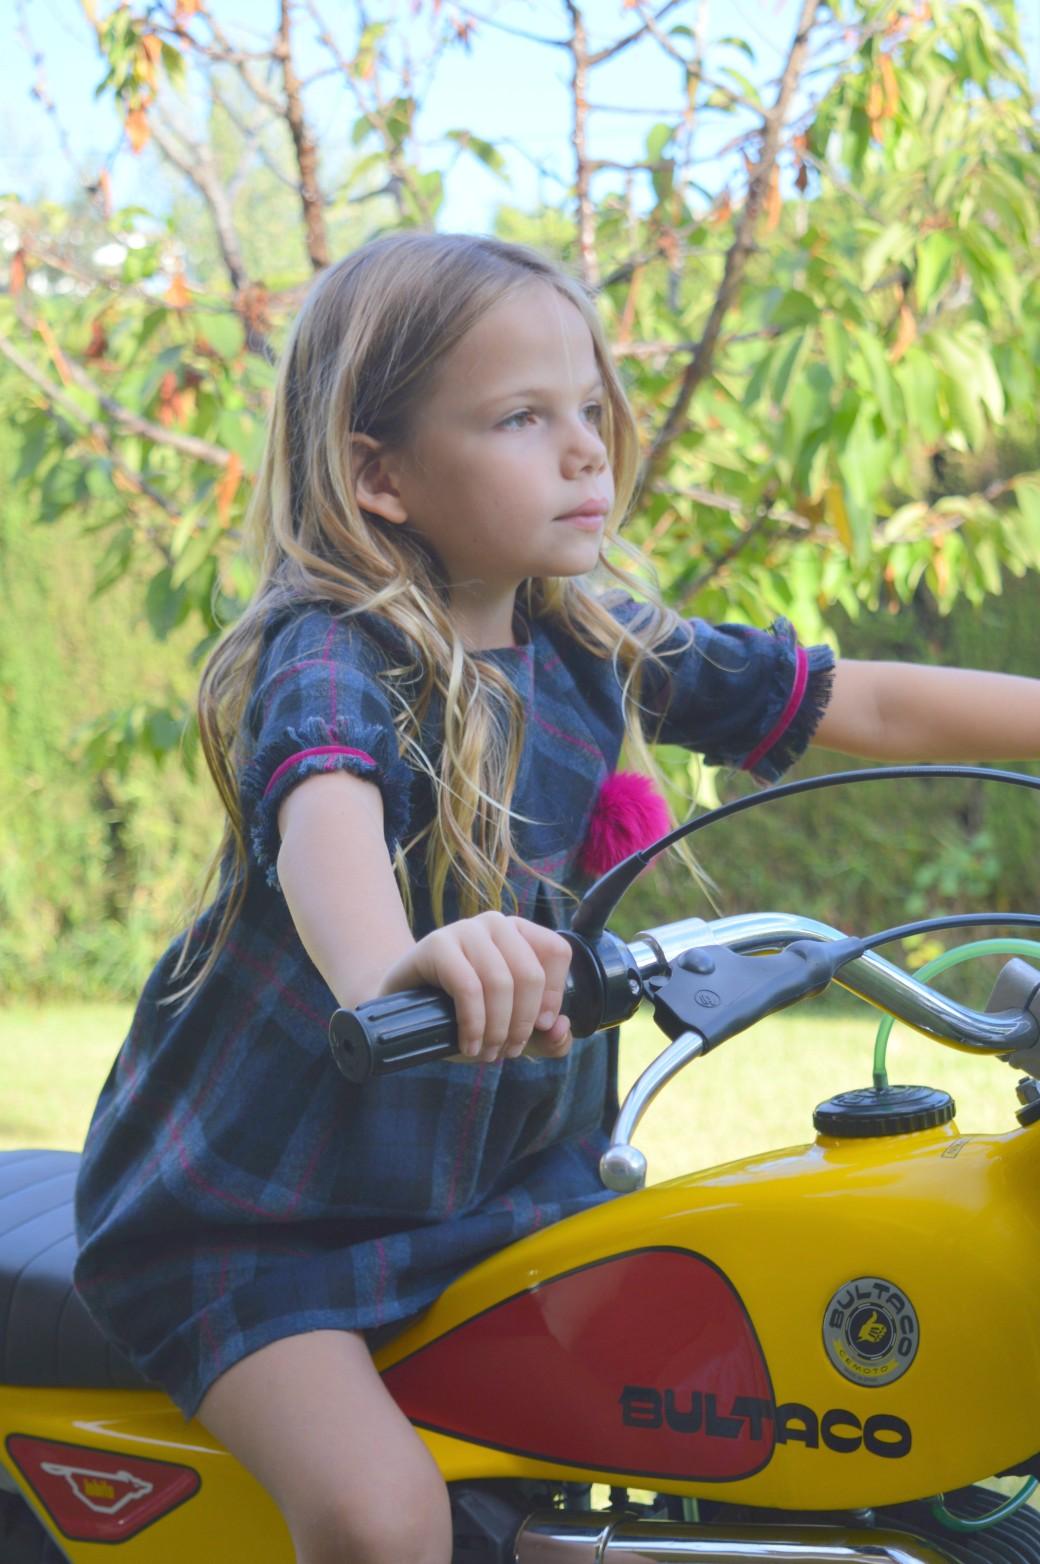 sanmar-tpl-blog-de-moda-infantil-41